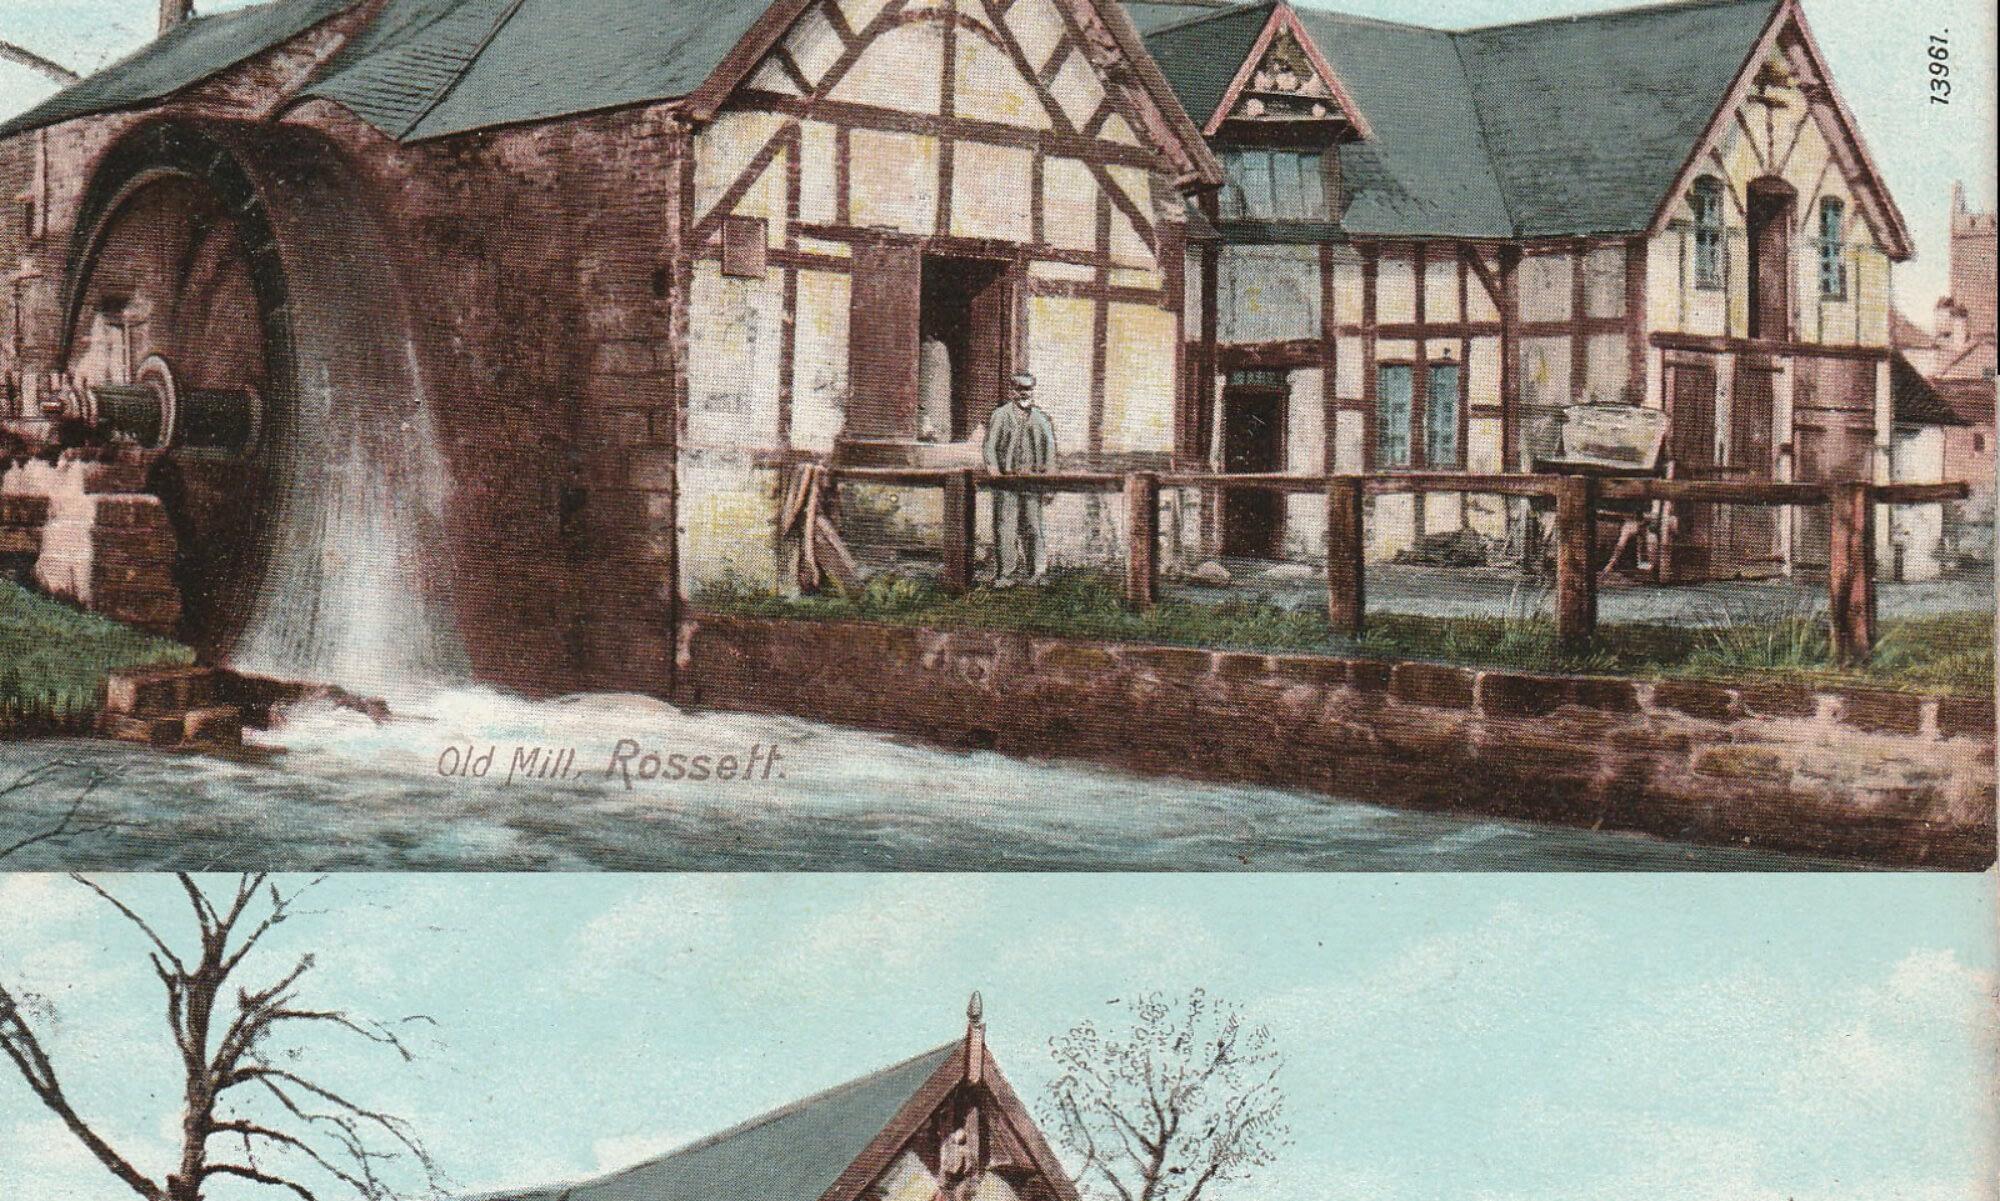 Rossett Village